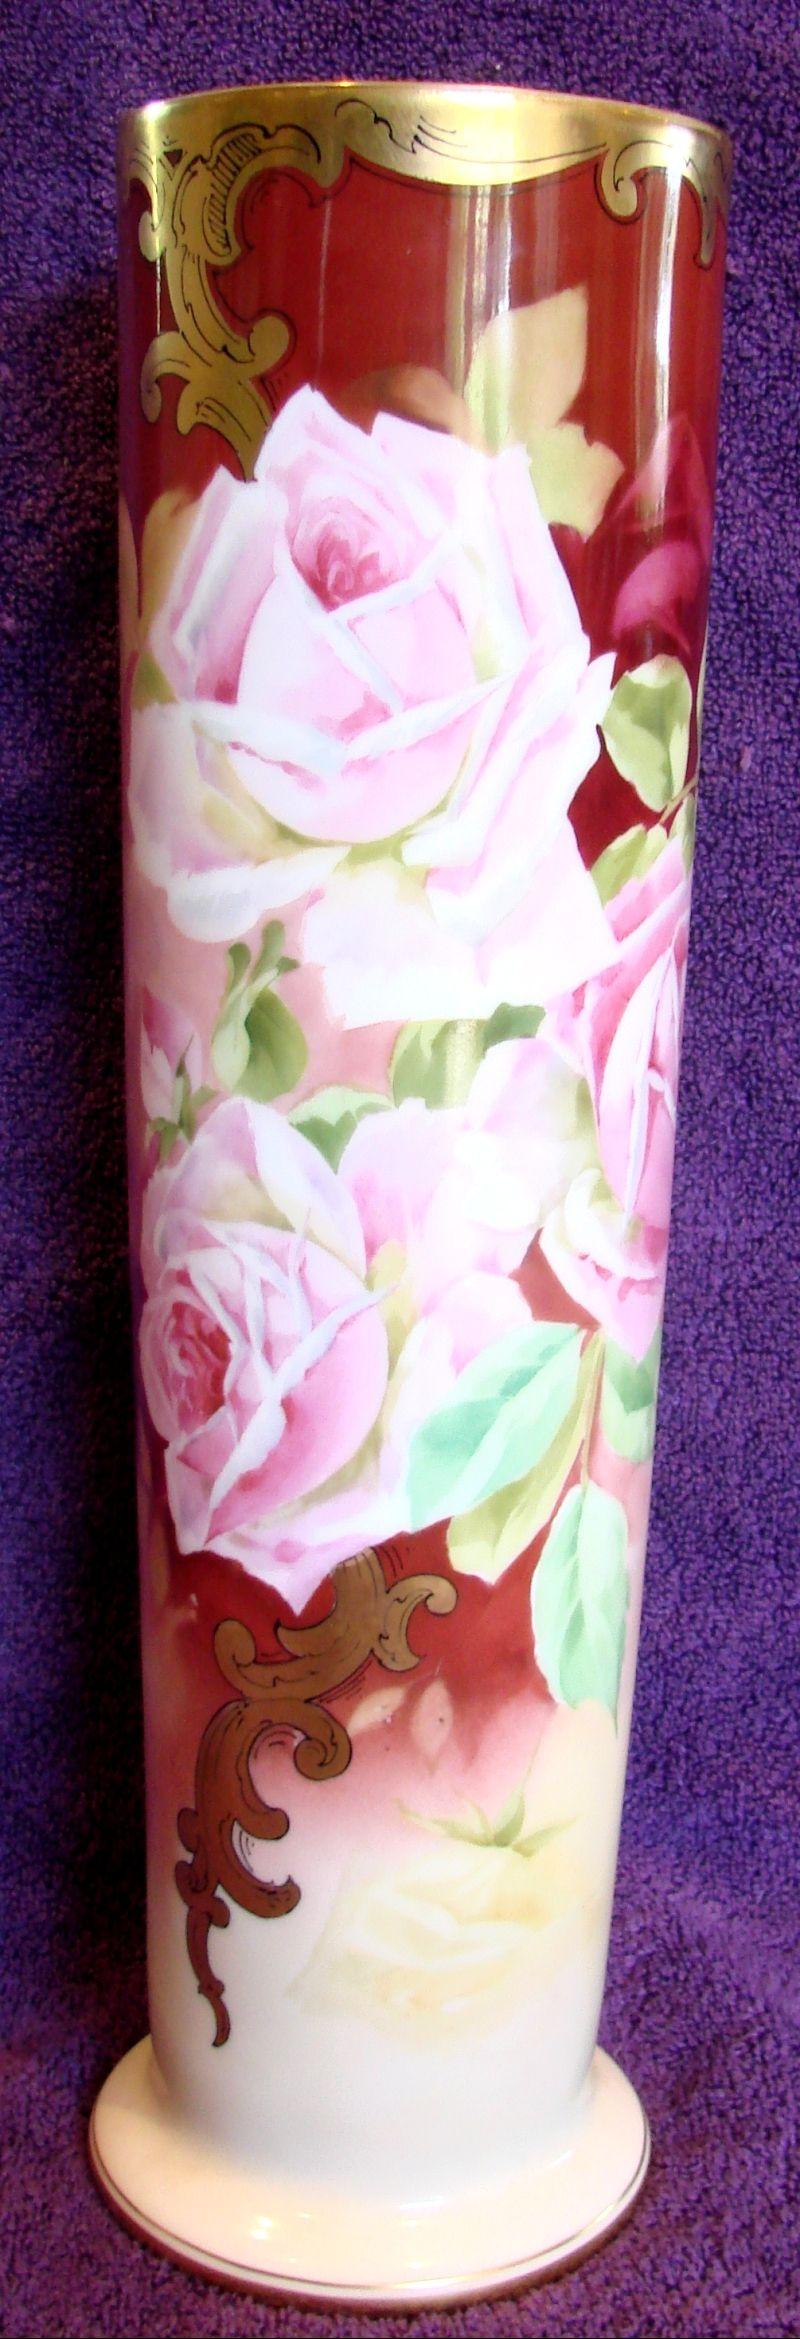 "French Limoges Vase 15.75"" w Huge Pink Roses American Pickard Stouffer Artist Samuel Heap c 1905 - 1906"